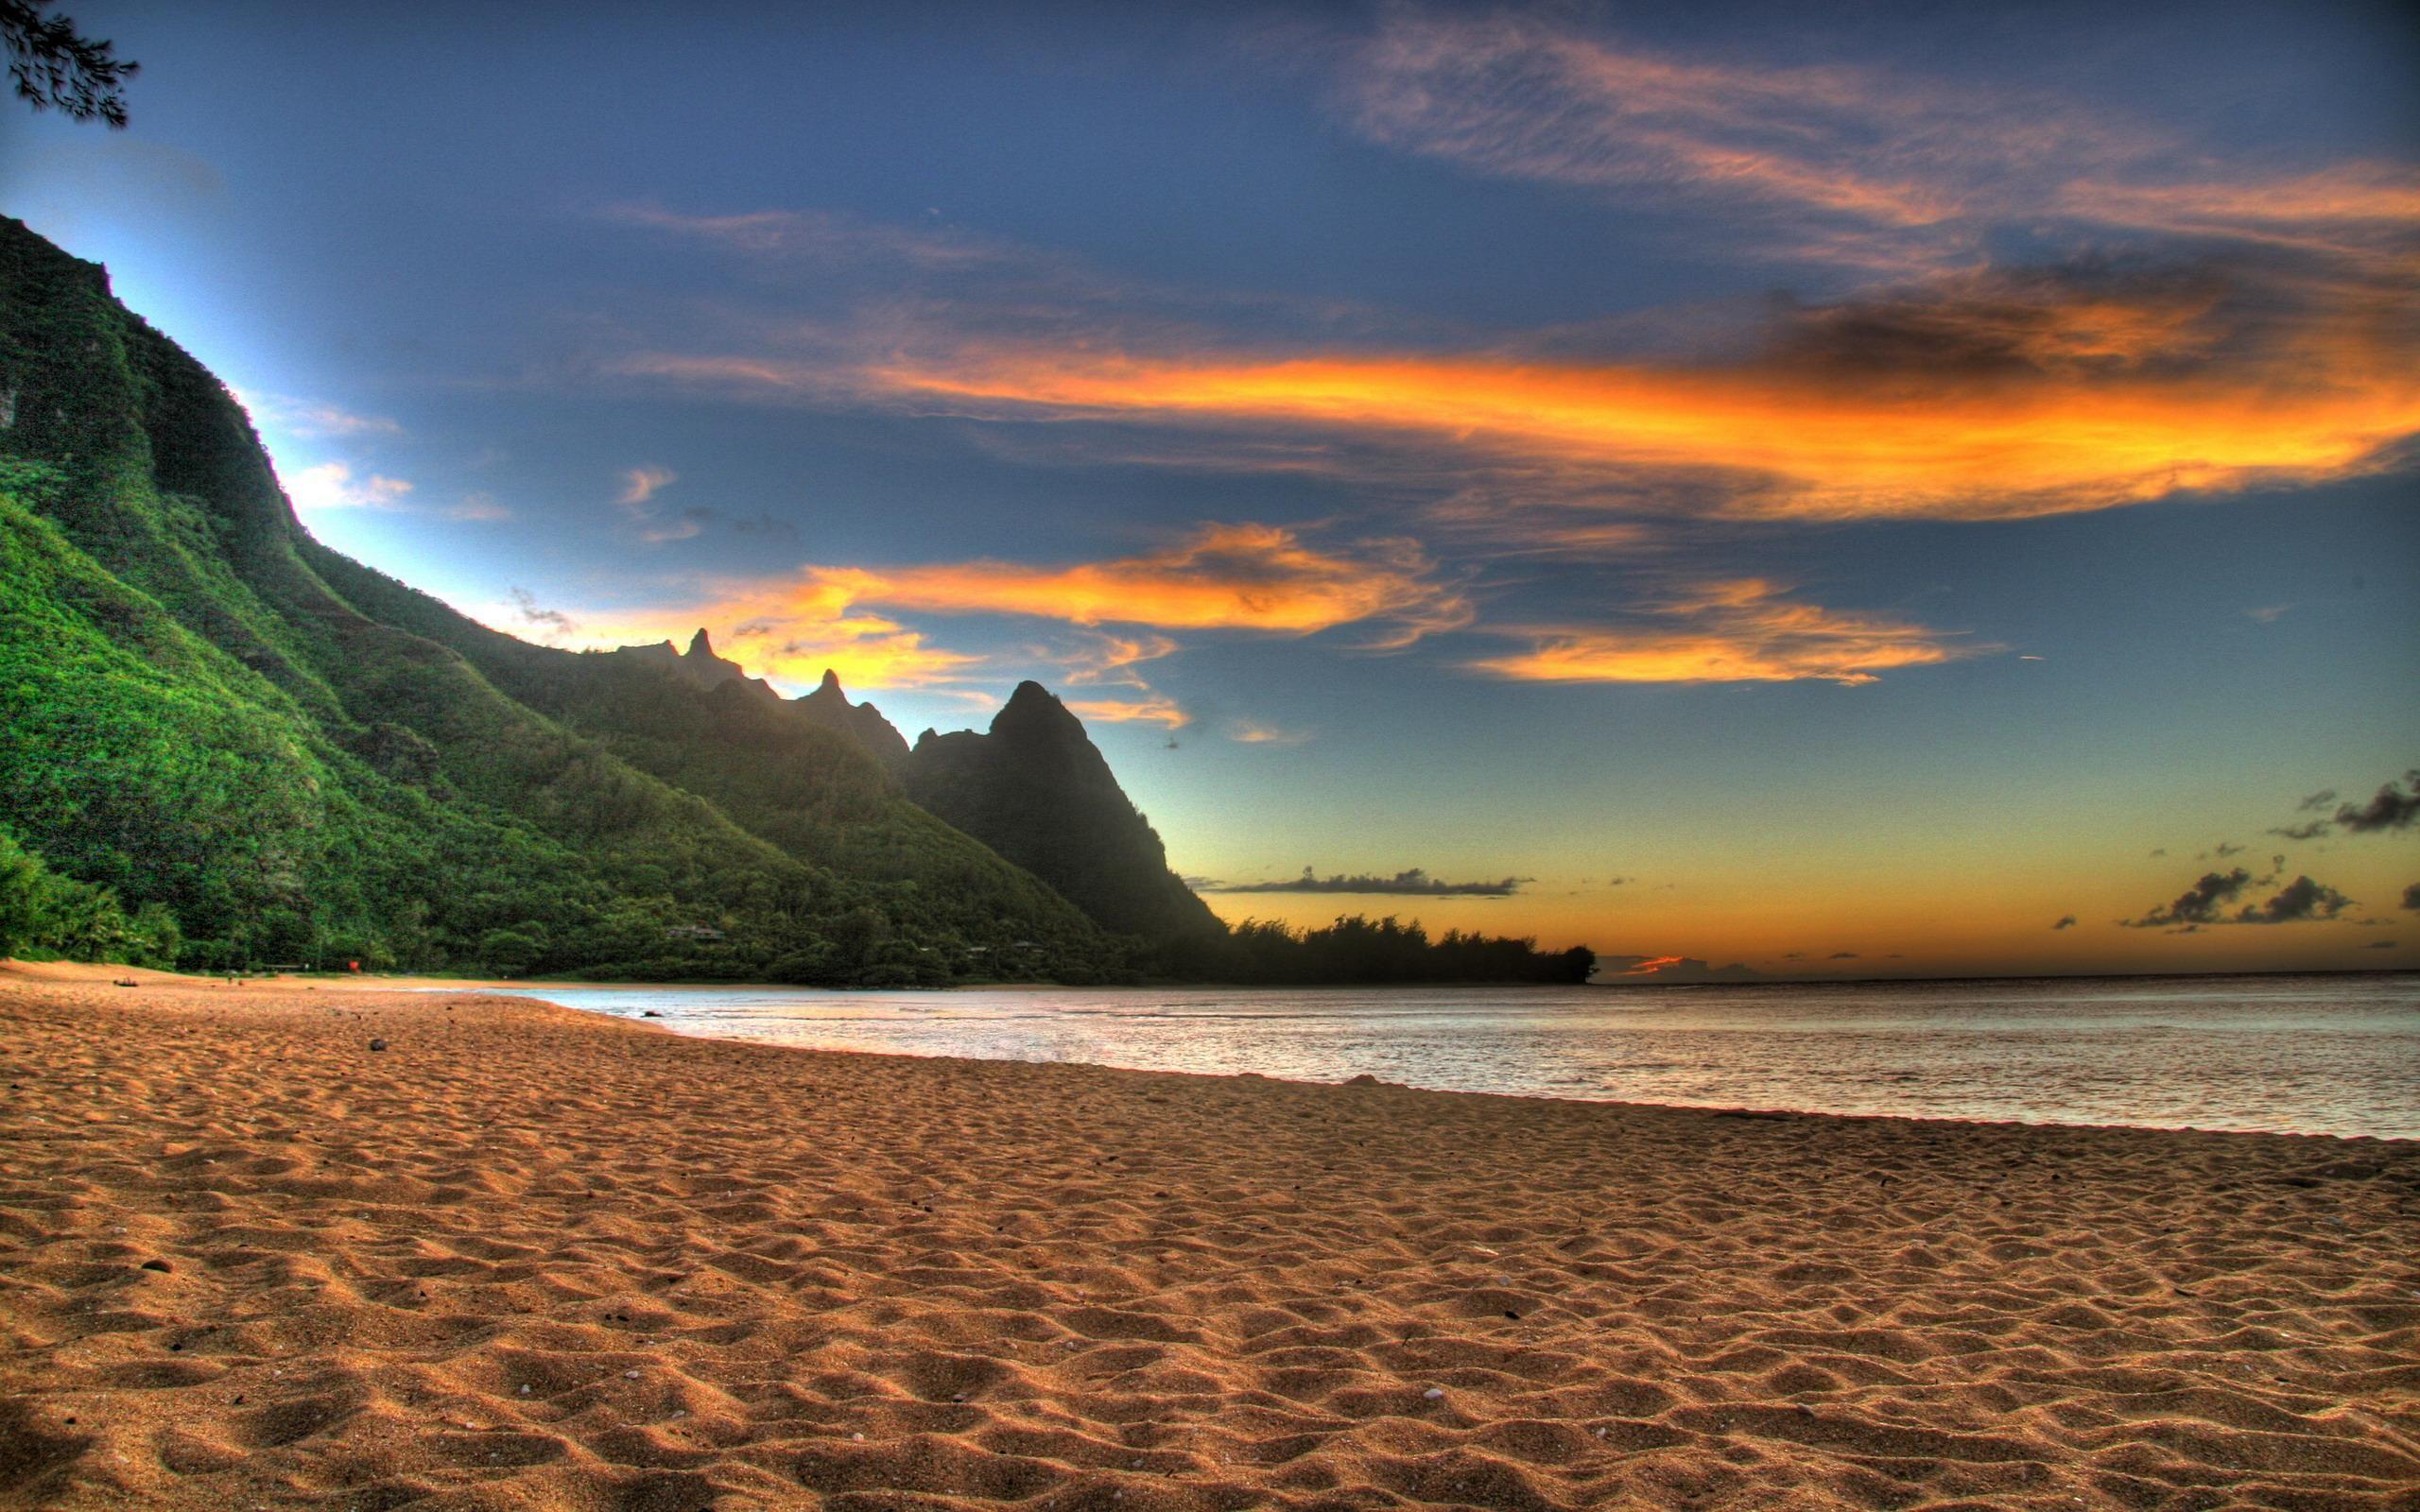 صور طبيعة جميلة Tunnels Beach Kauai Beach Sunset Wallpaper Beach Images